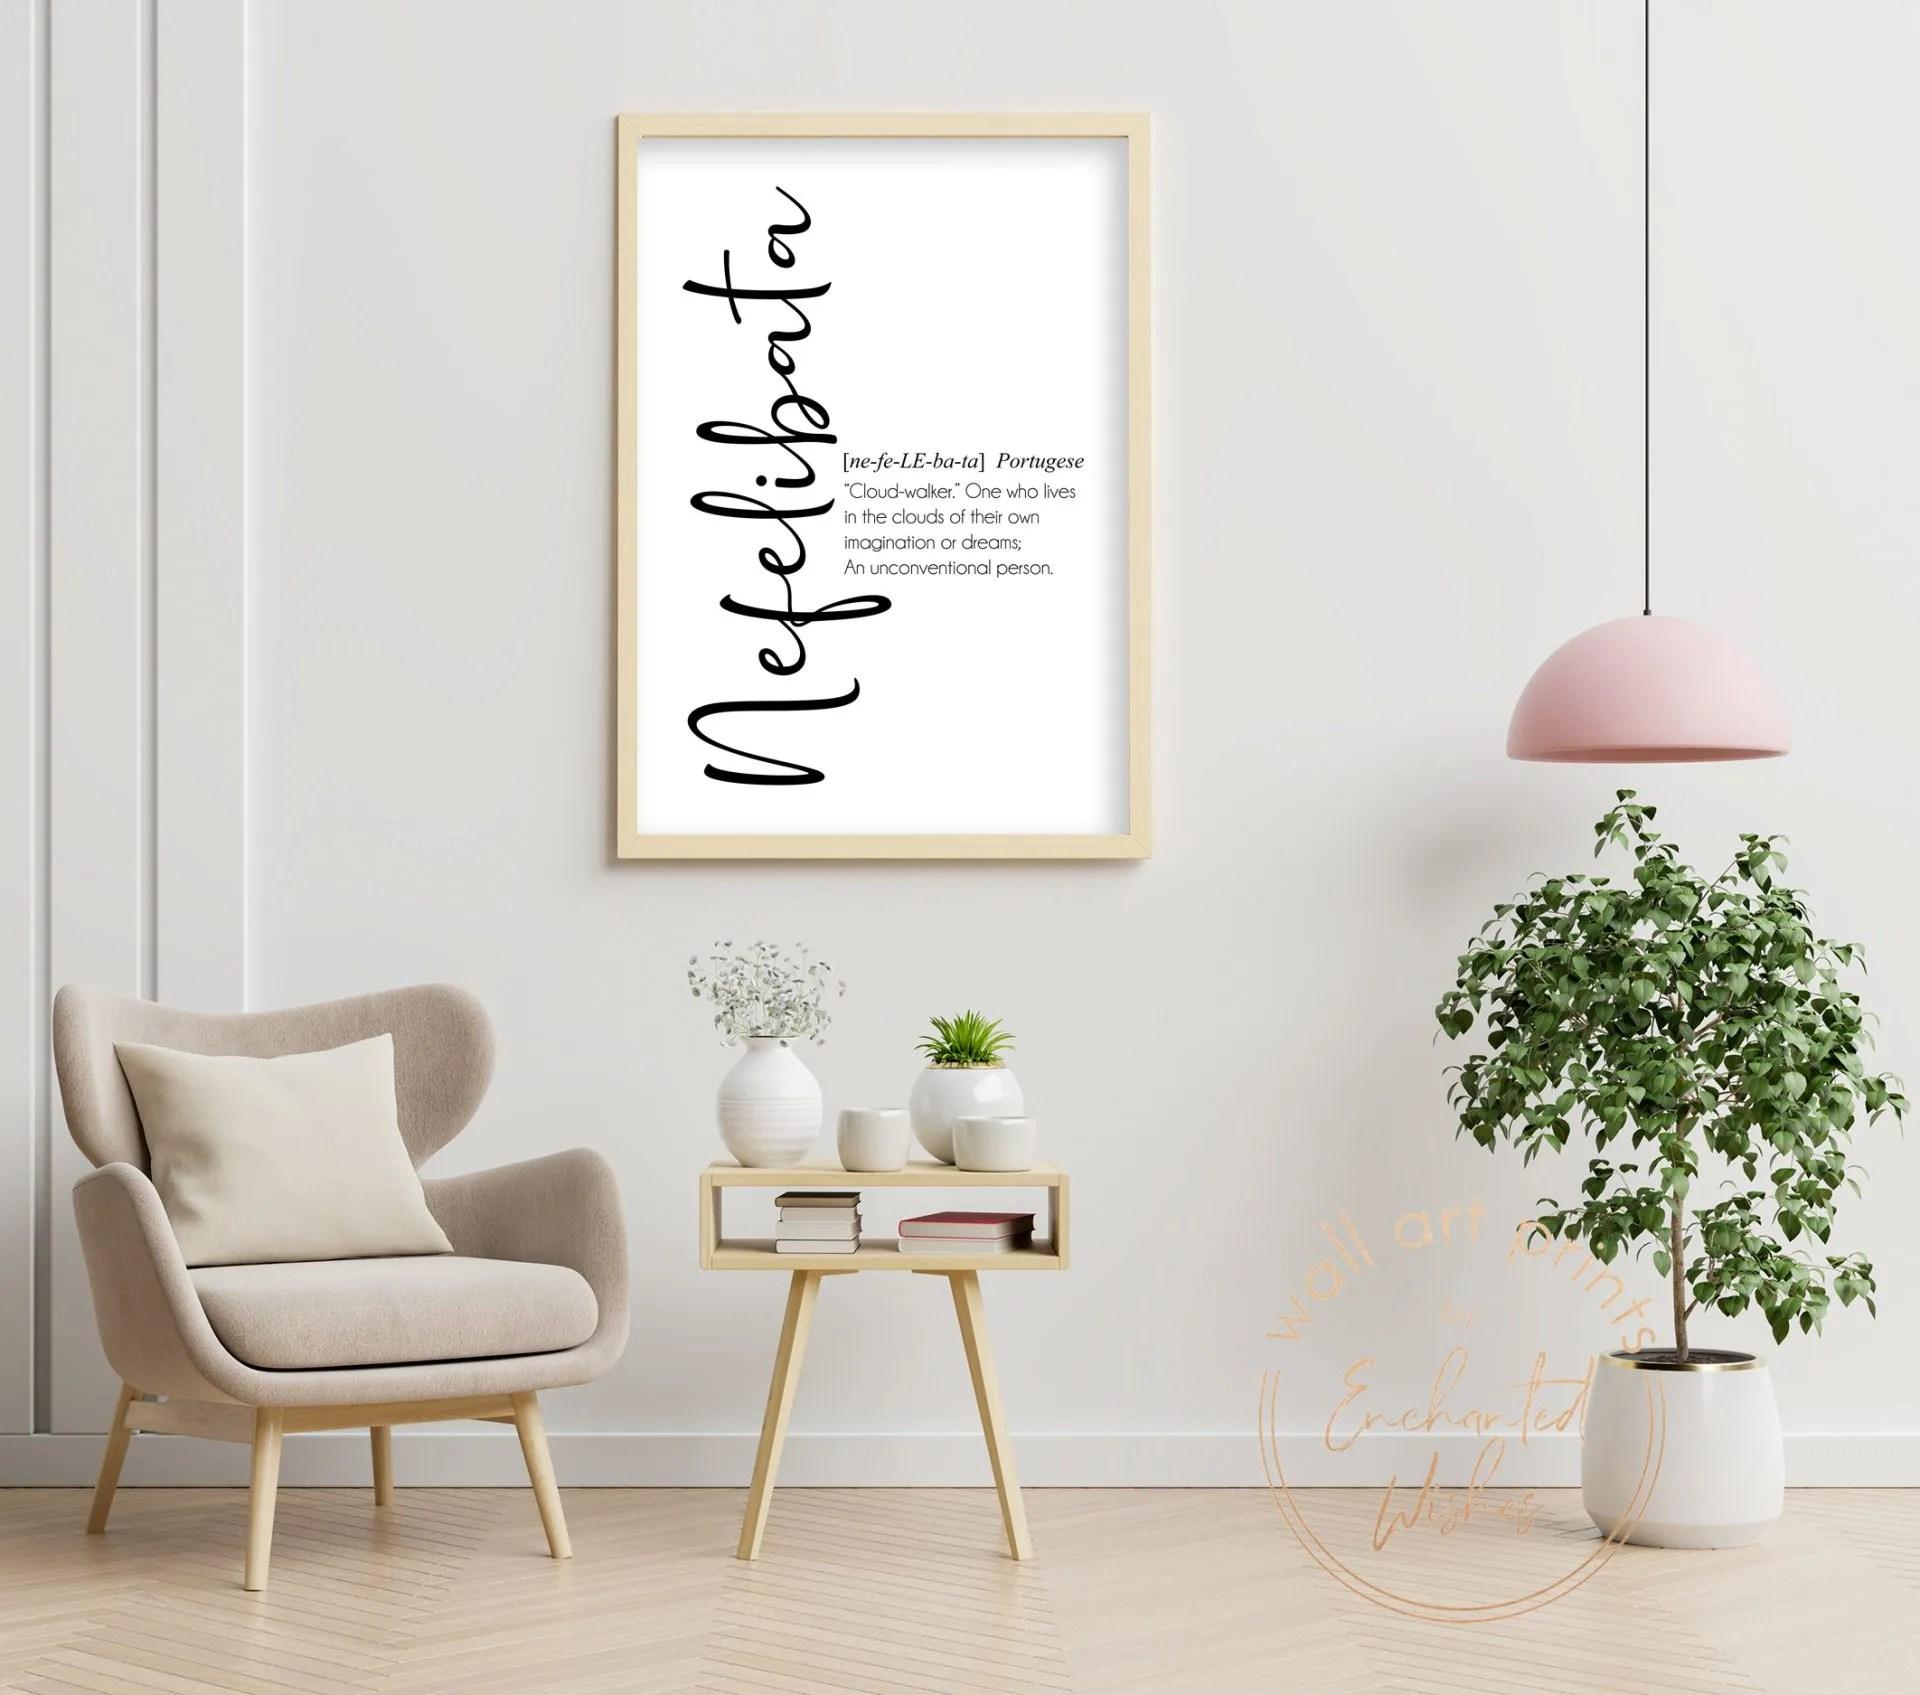 Nefelibata definition print